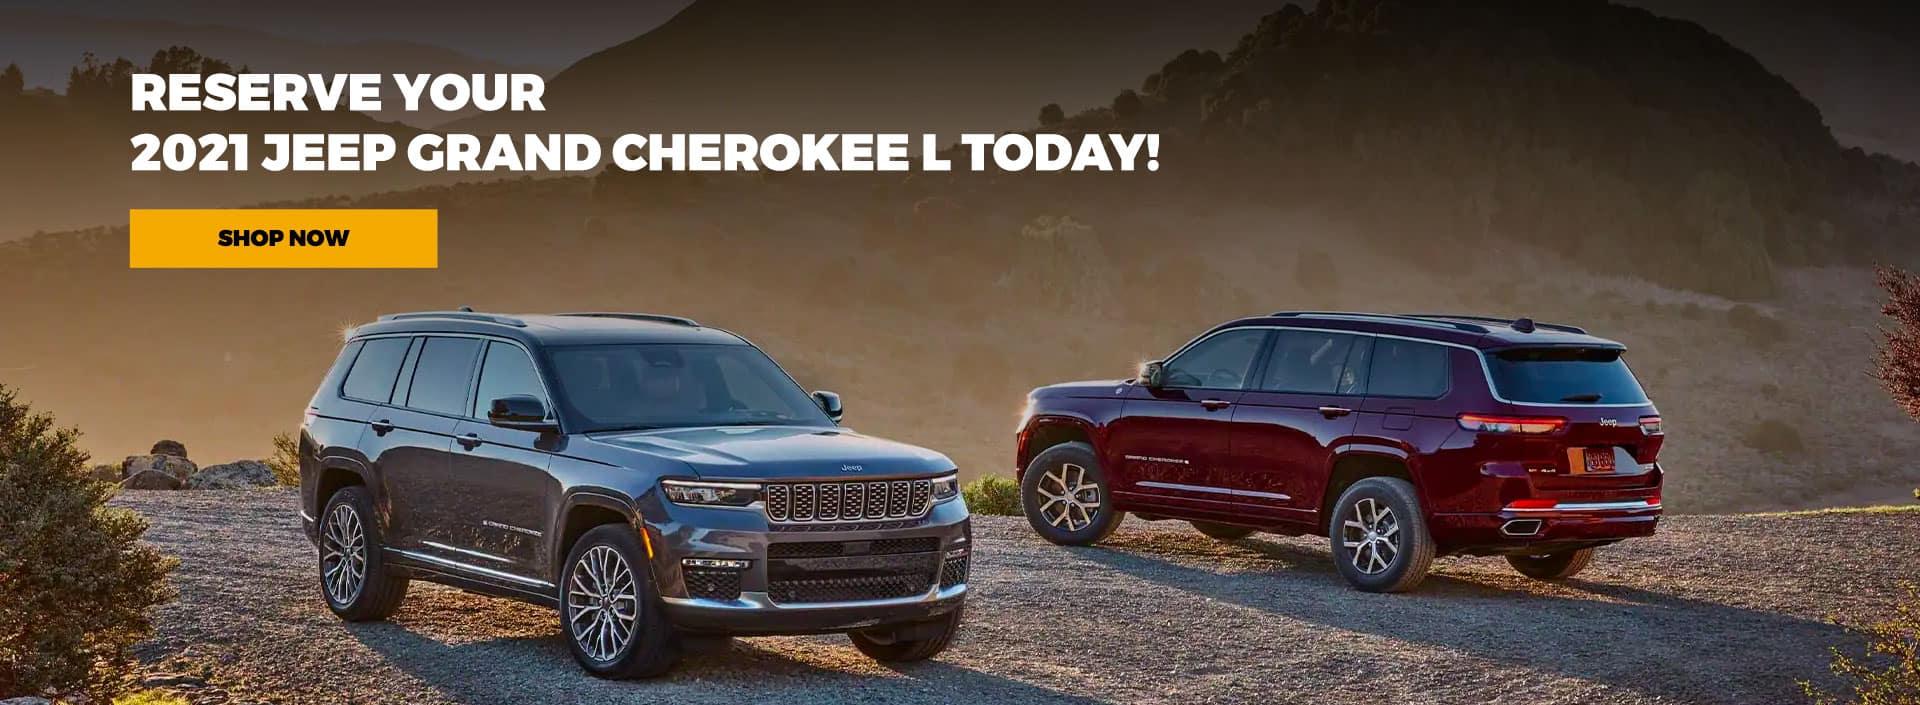 SPD_Reserve Grand Cherokee July21